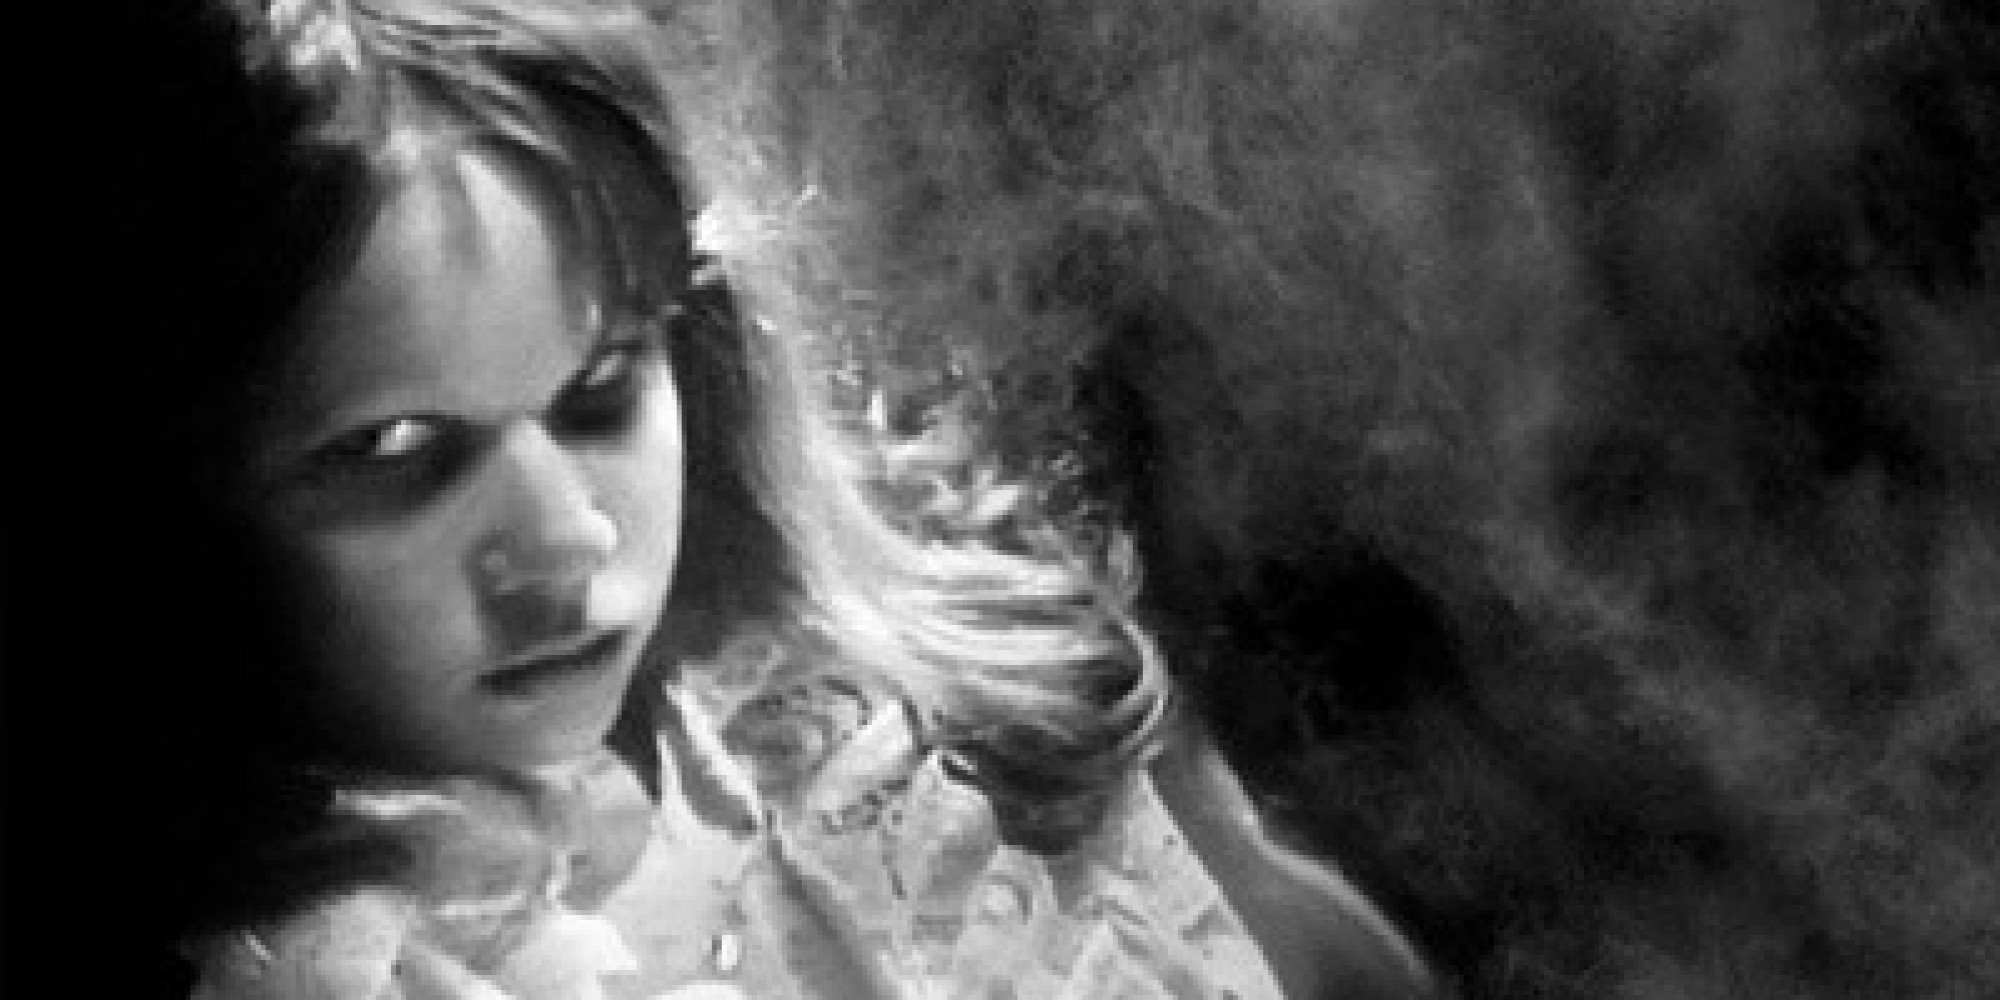 dress - The regan exorcist pictures video